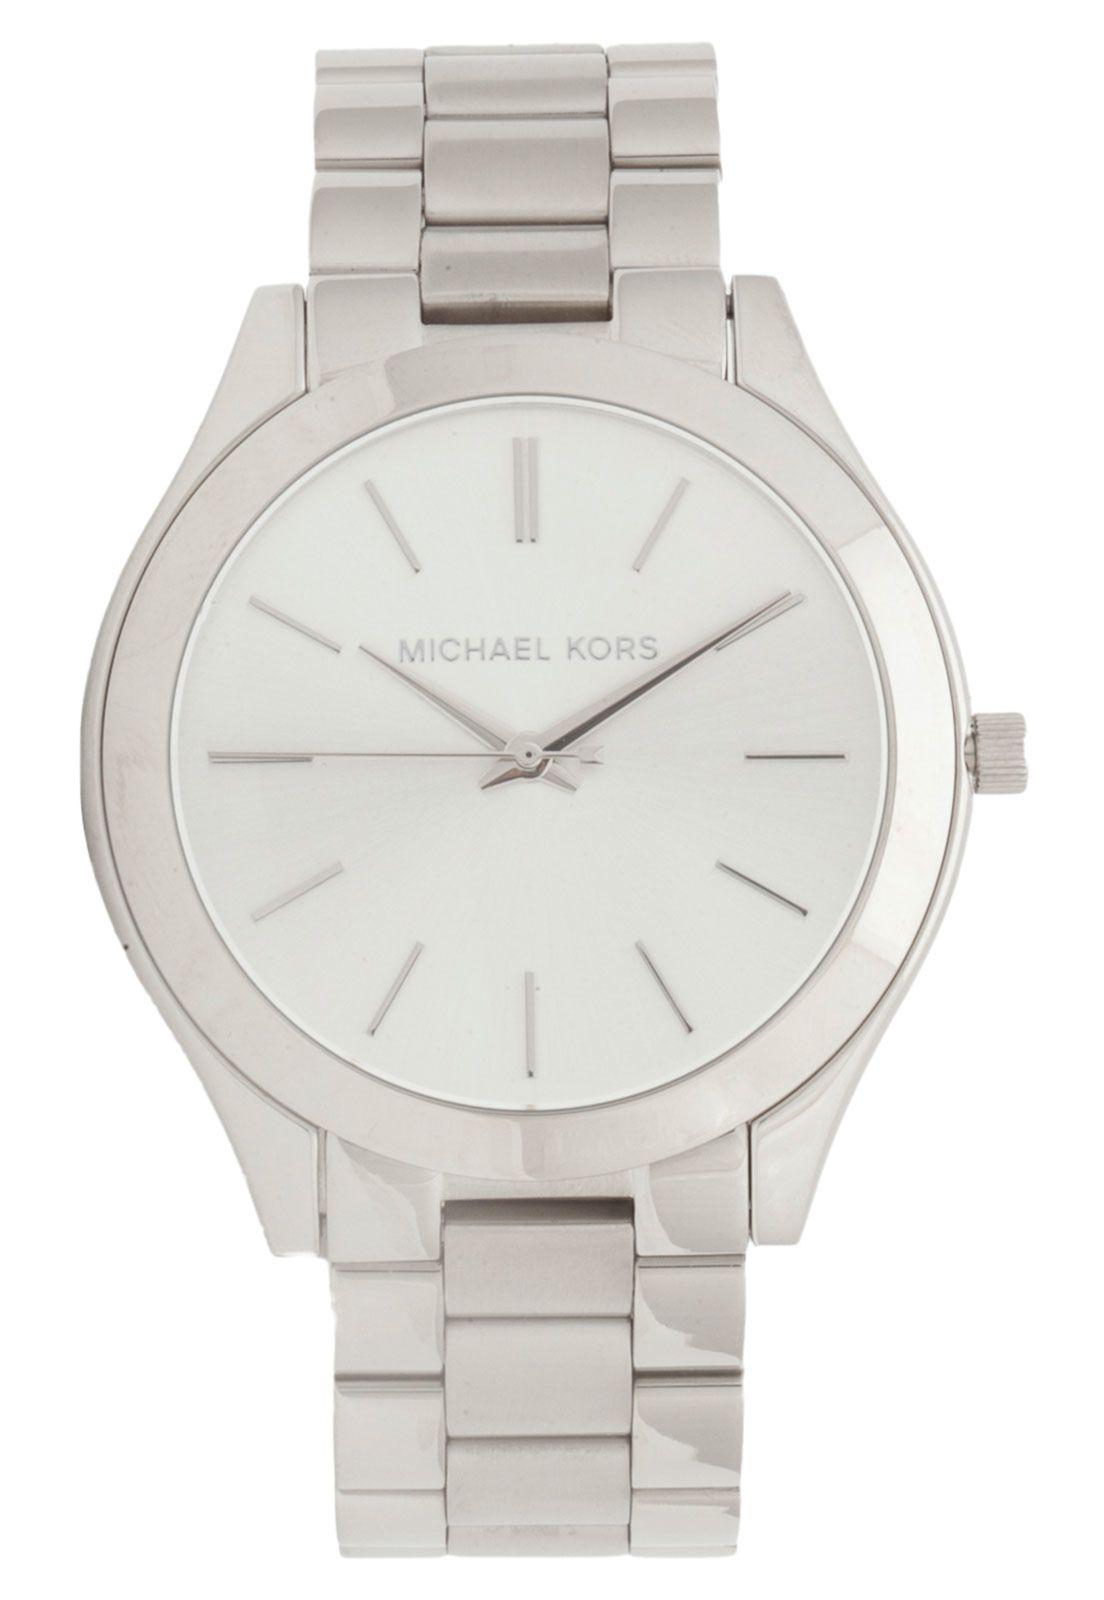 56faf82e818f1 Relógio Michael Kors MK3178 1KN Prata   Products   Michael kors ...